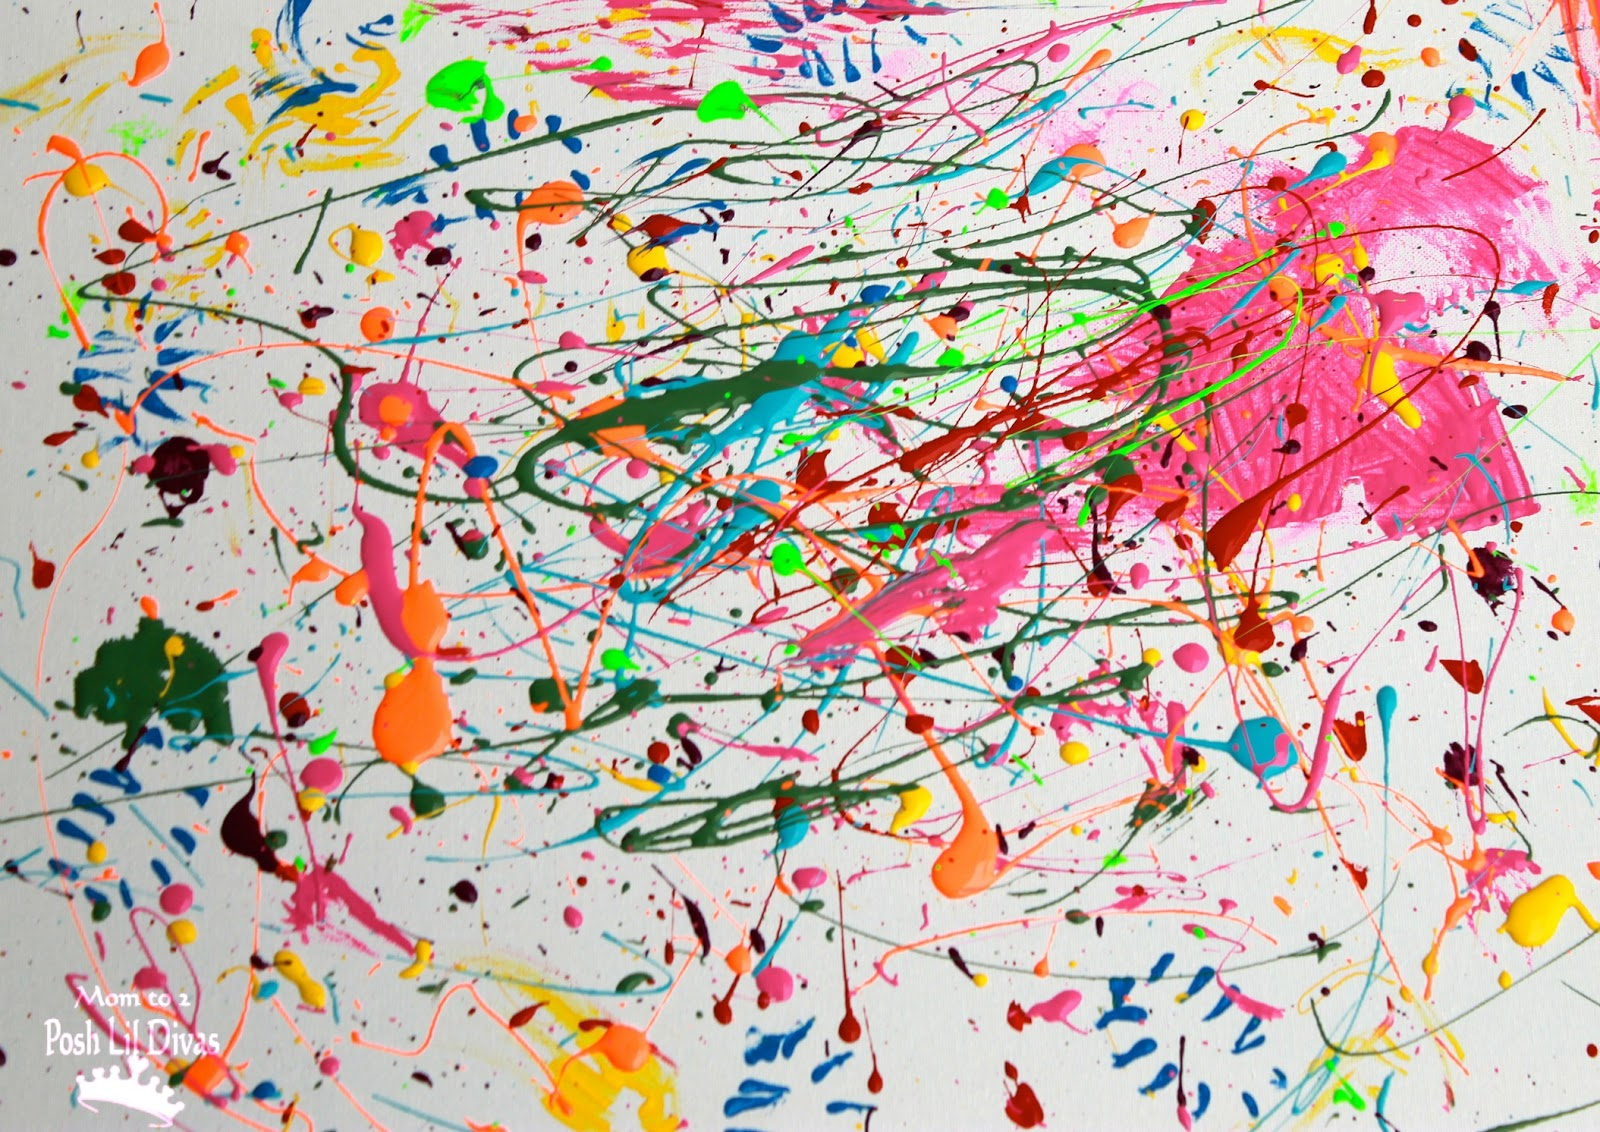 Mom to 2 Posh Lil Divas: Kids Get Arty - Splatter Painting Like ...